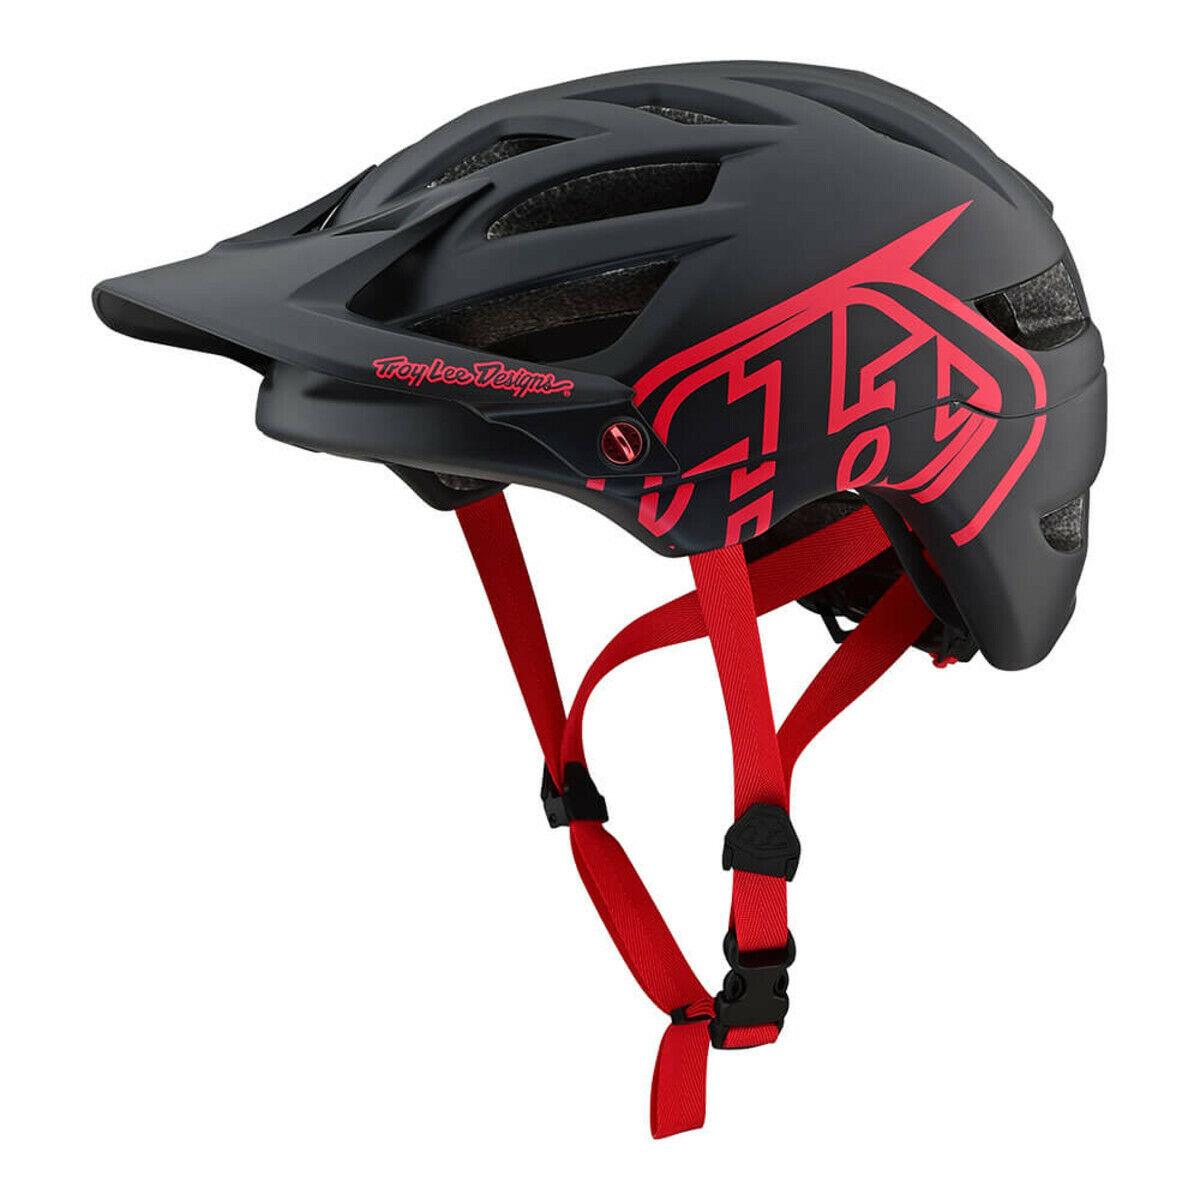 Troy Lee Designs A1 Drone Casque schwarz rot XL 2X